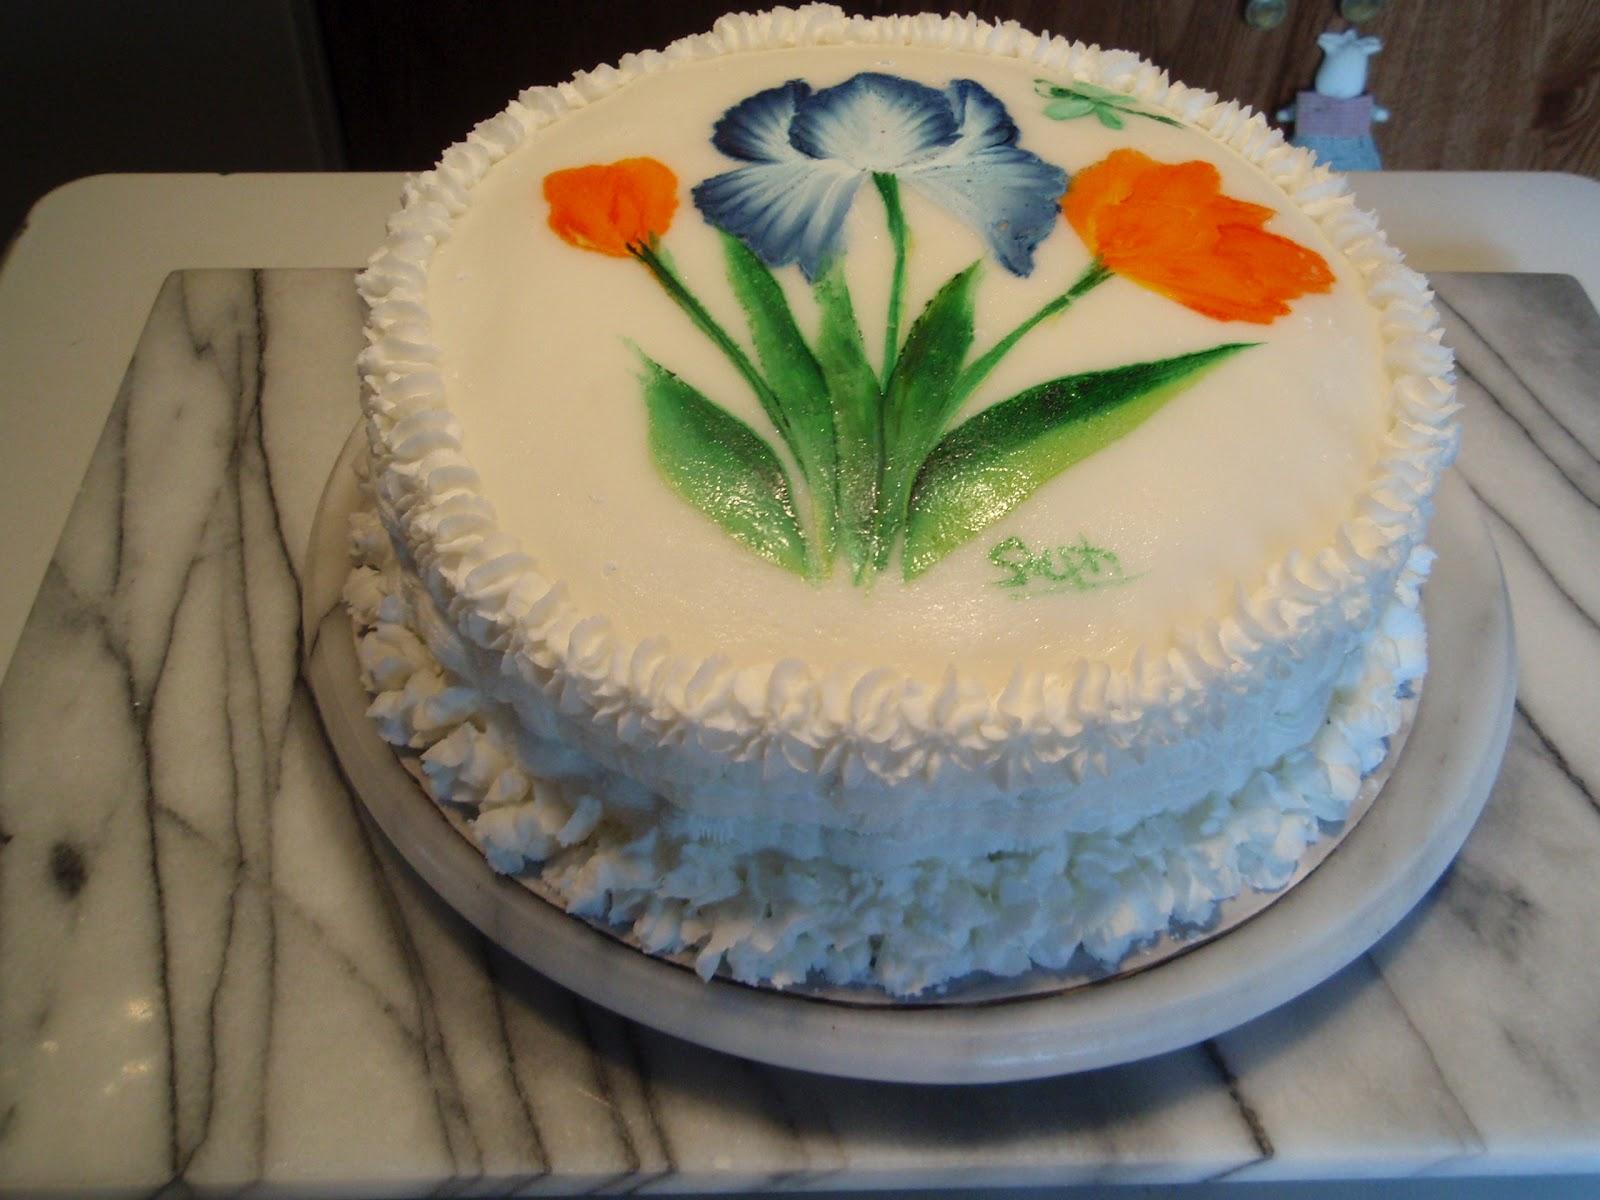 Totsie s Cakes & More: January Birthday Cakes